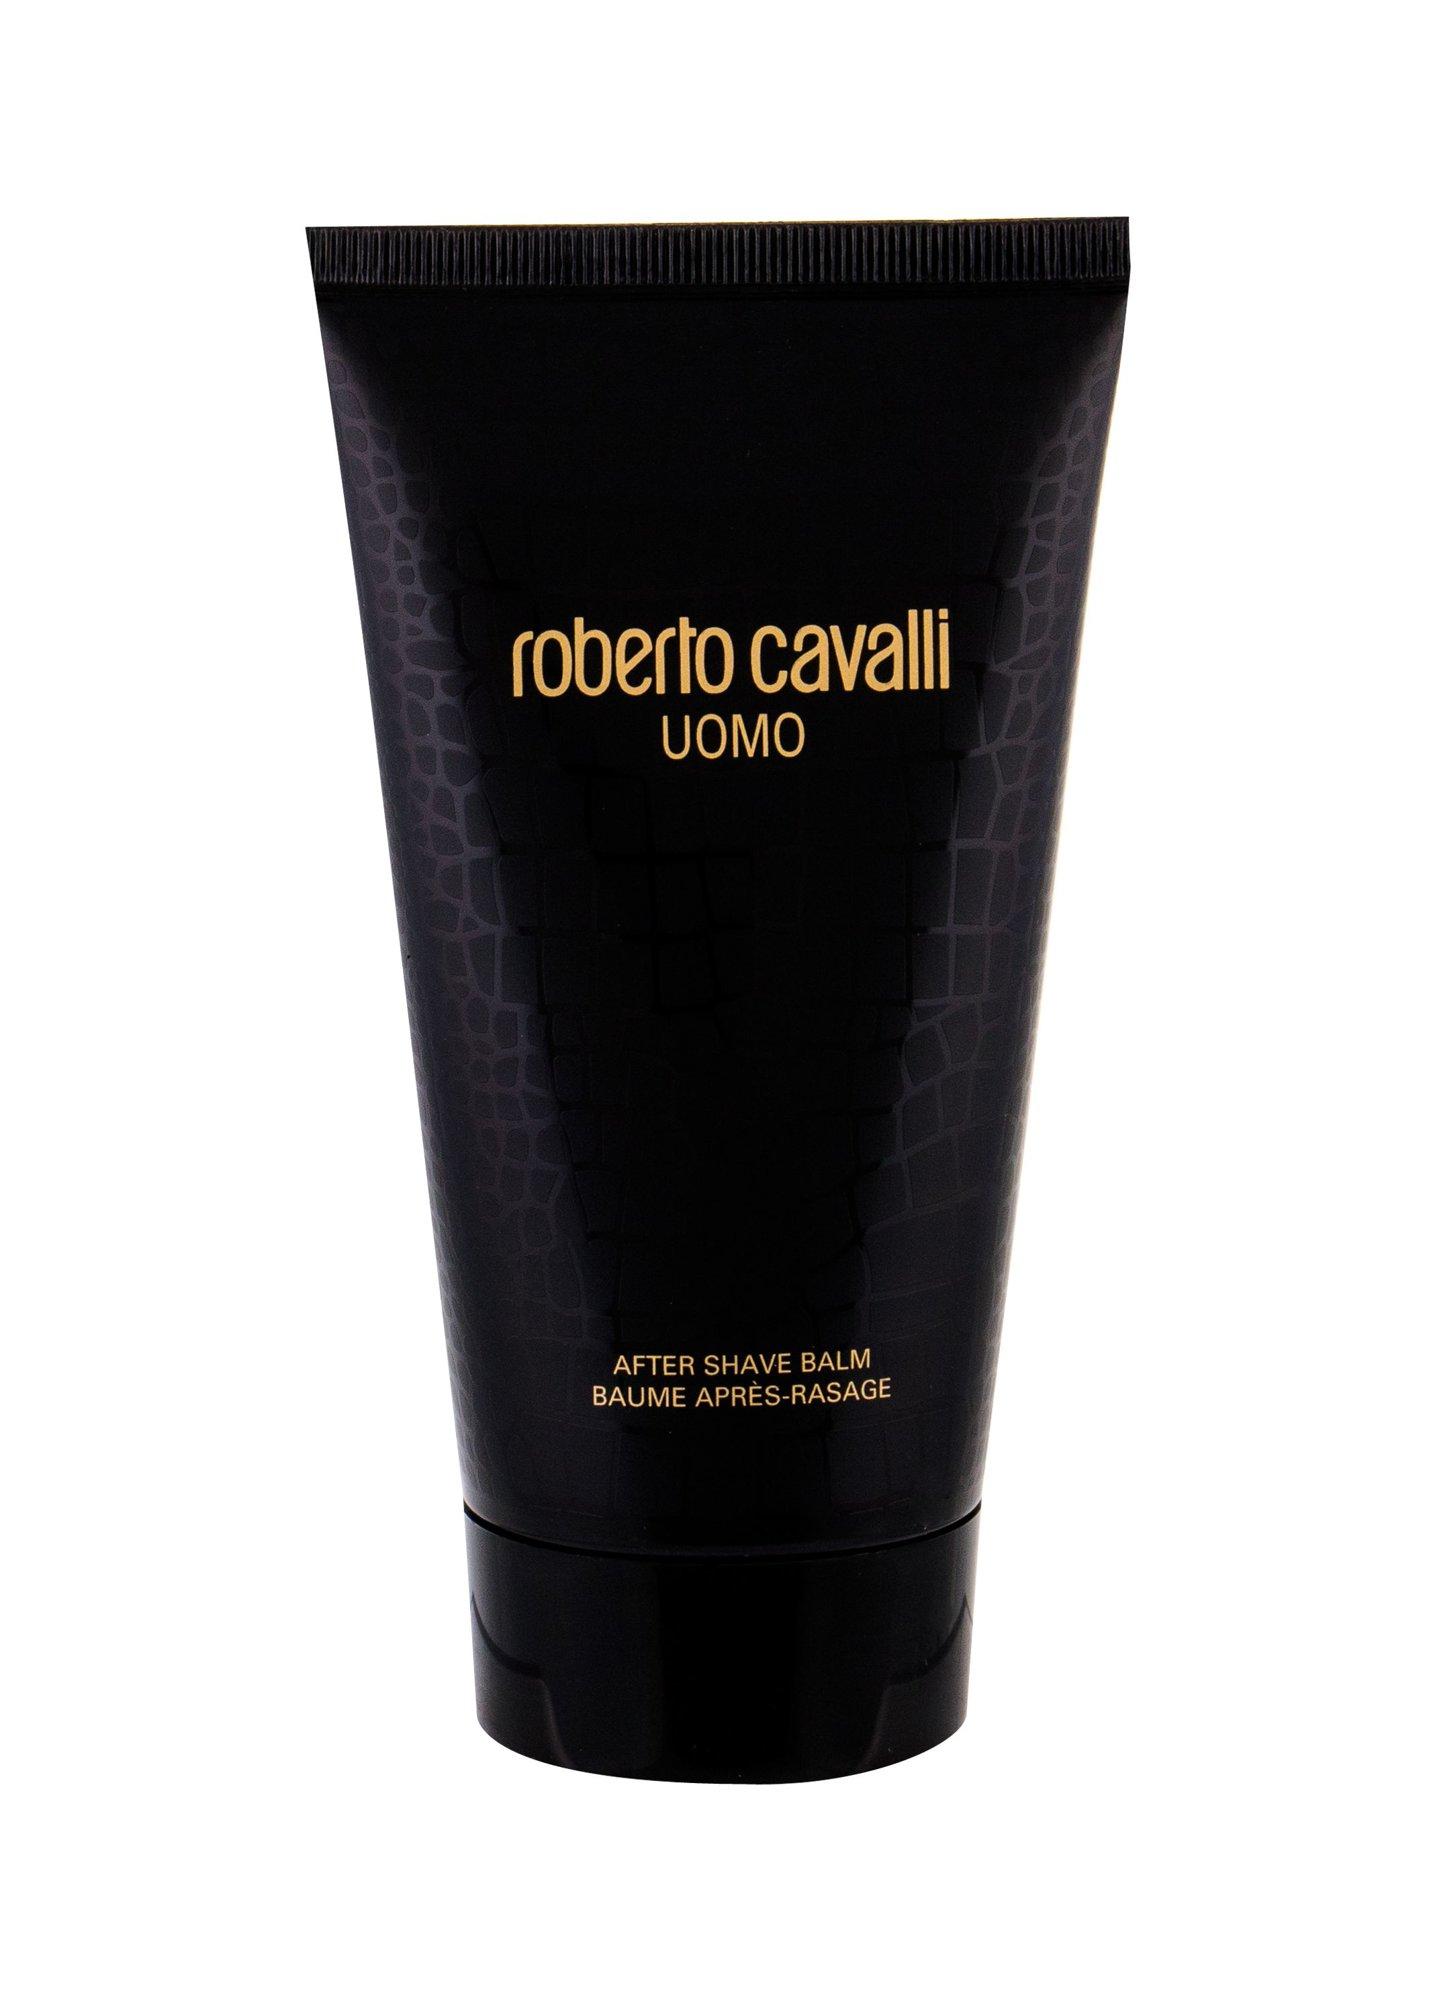 Roberto Cavalli Uomo Aftershave Balm 150ml